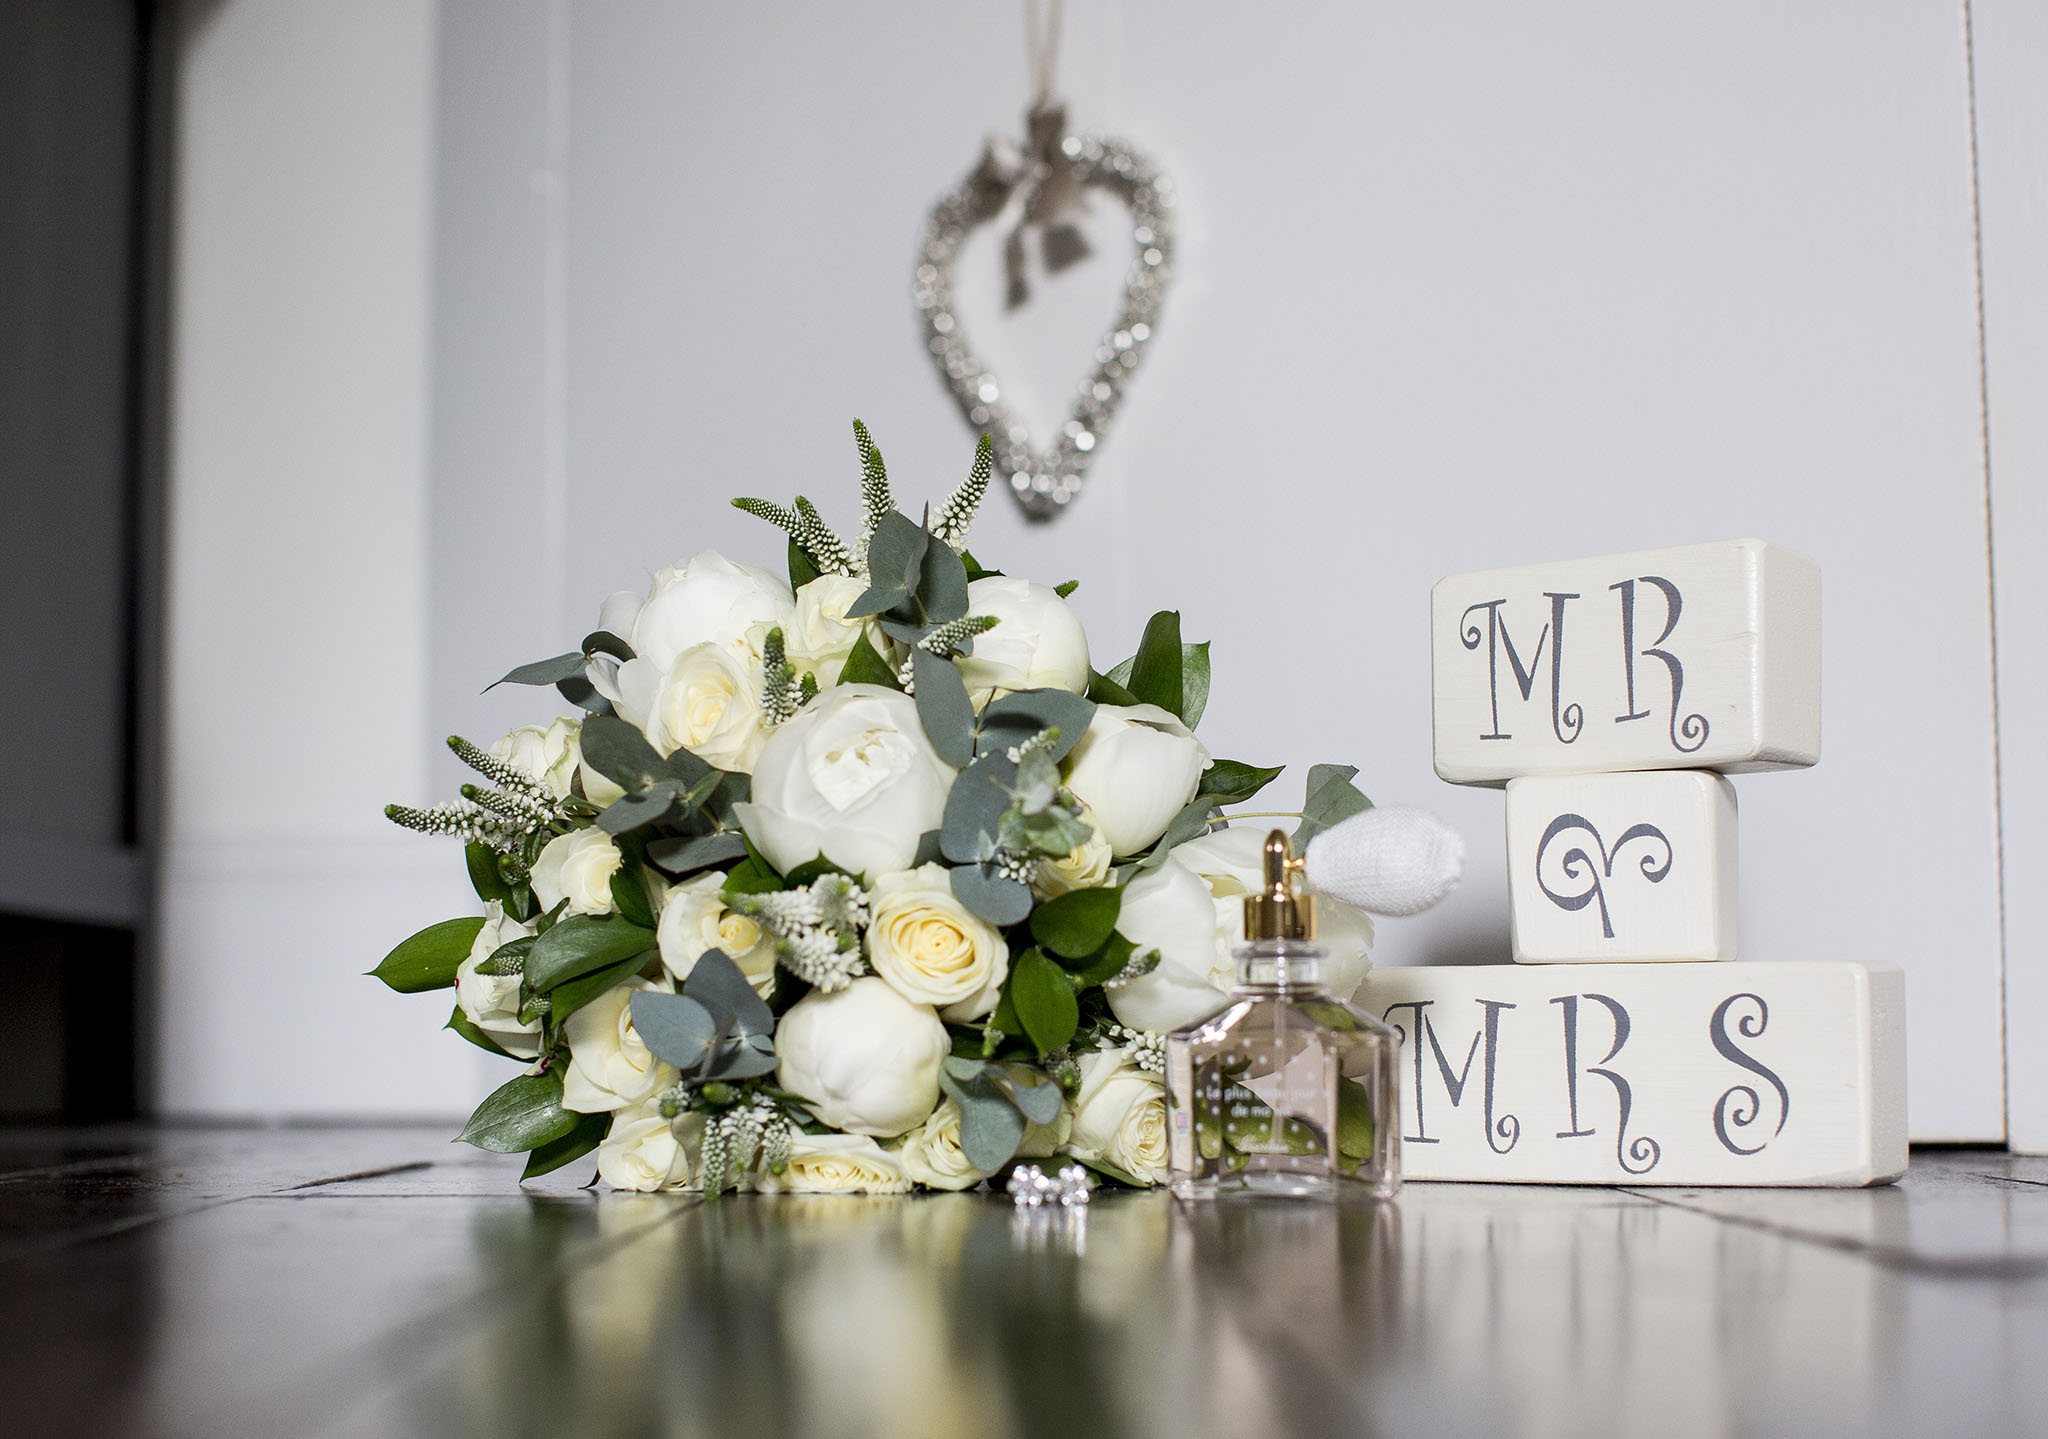 elizabethgphotography_kingslangley_hertfordshire_fineart_wedding_enfield_ricky_nicole_nahlis_01.jpg